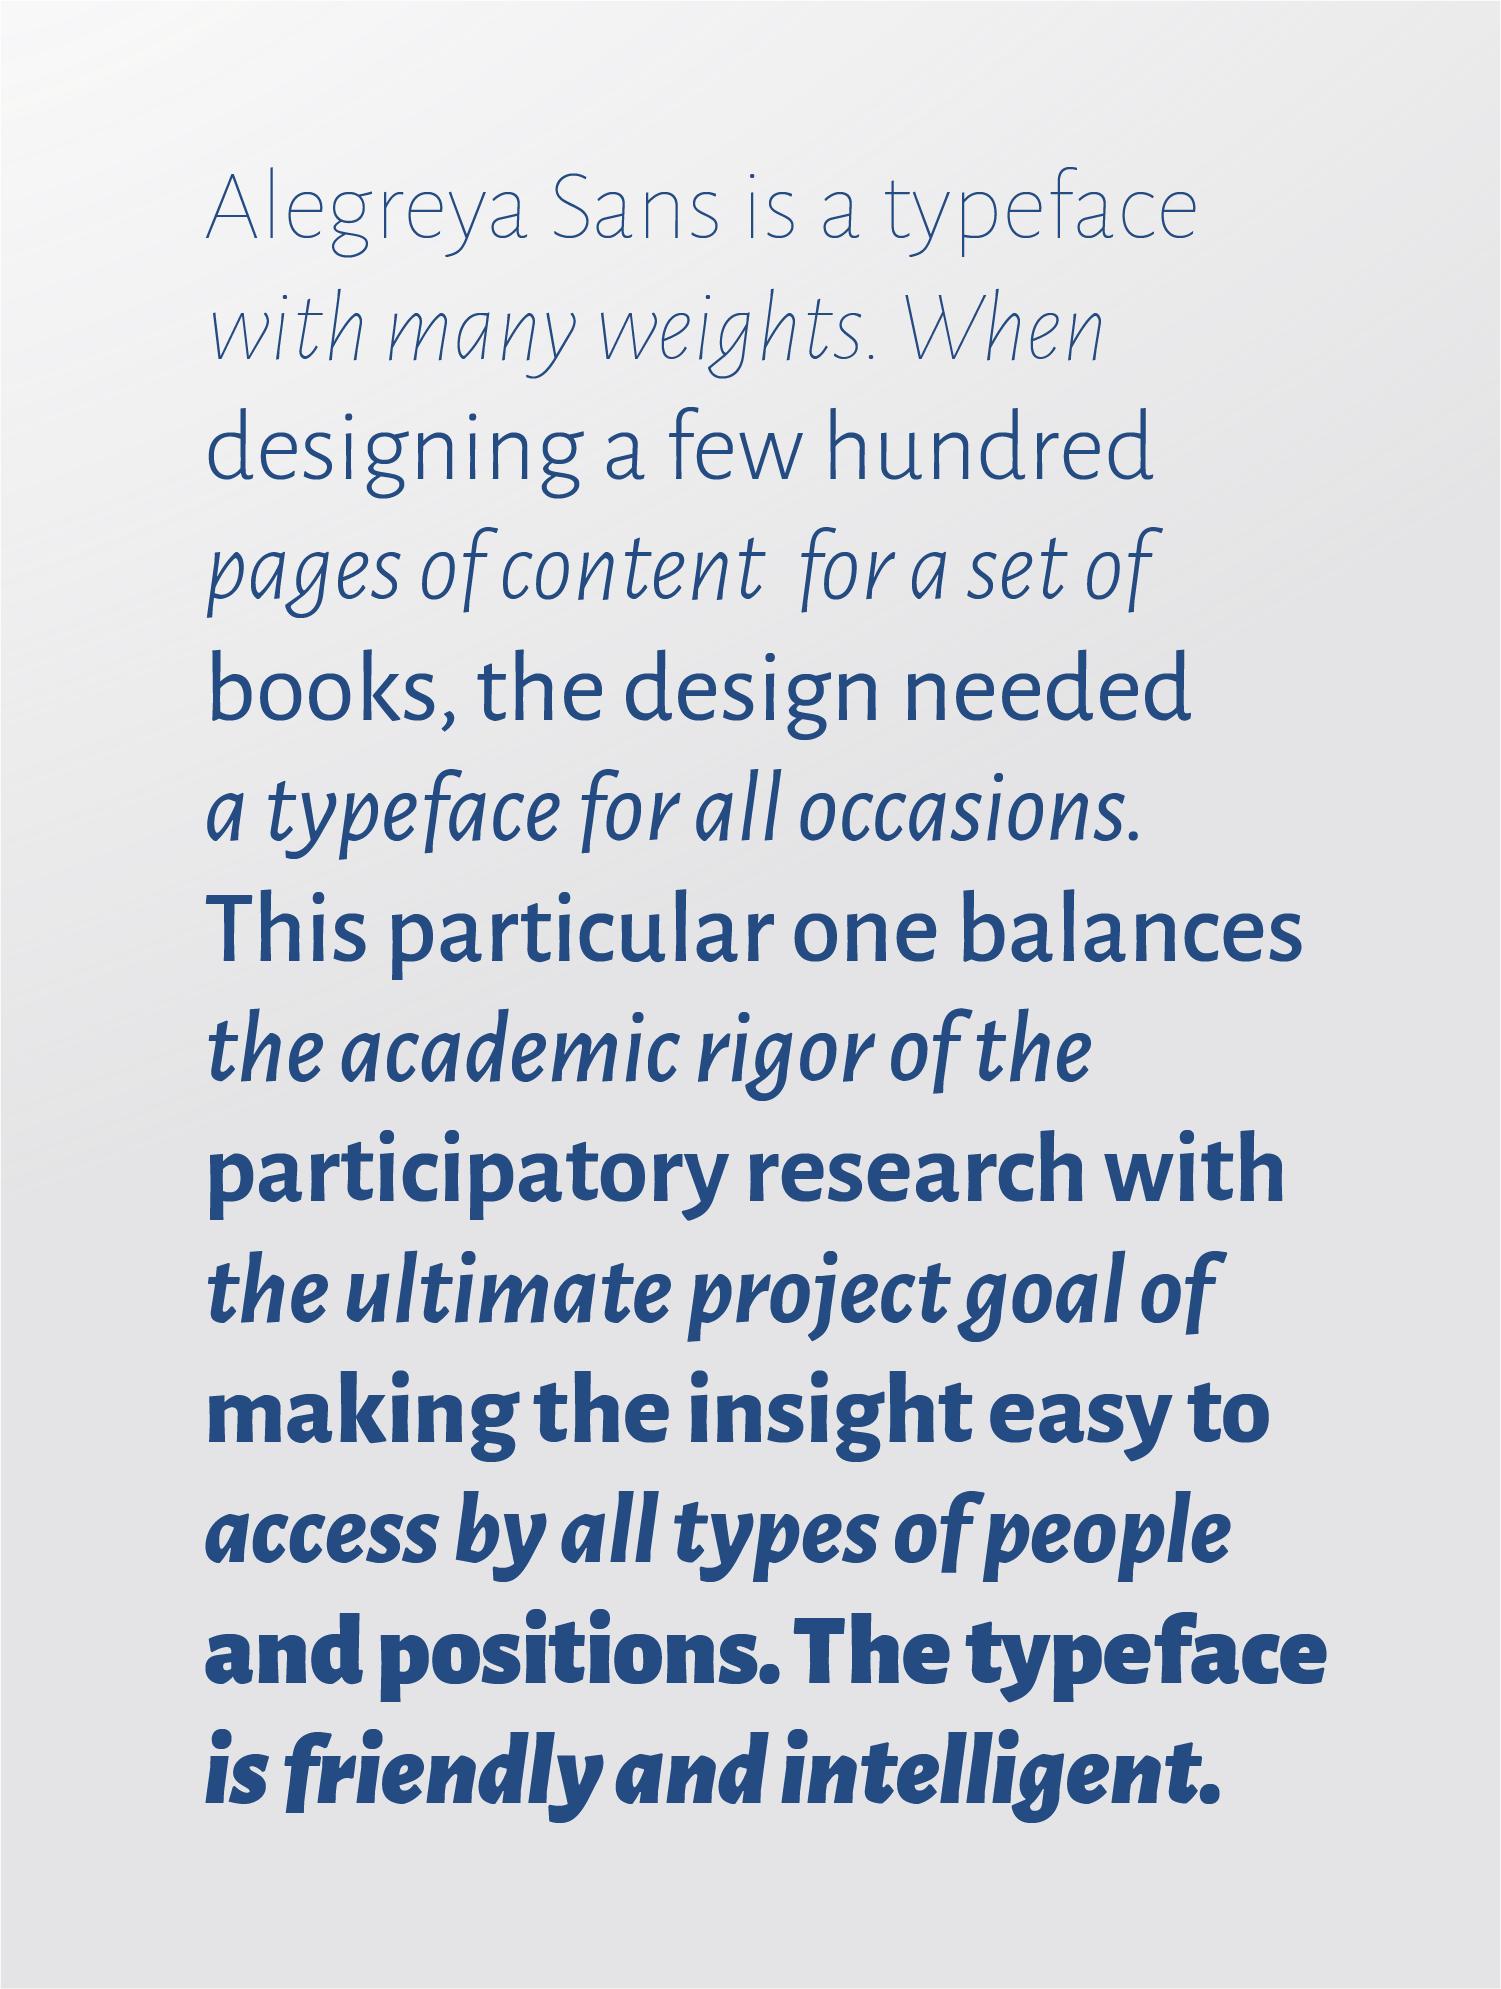 PCL_Typeface.png